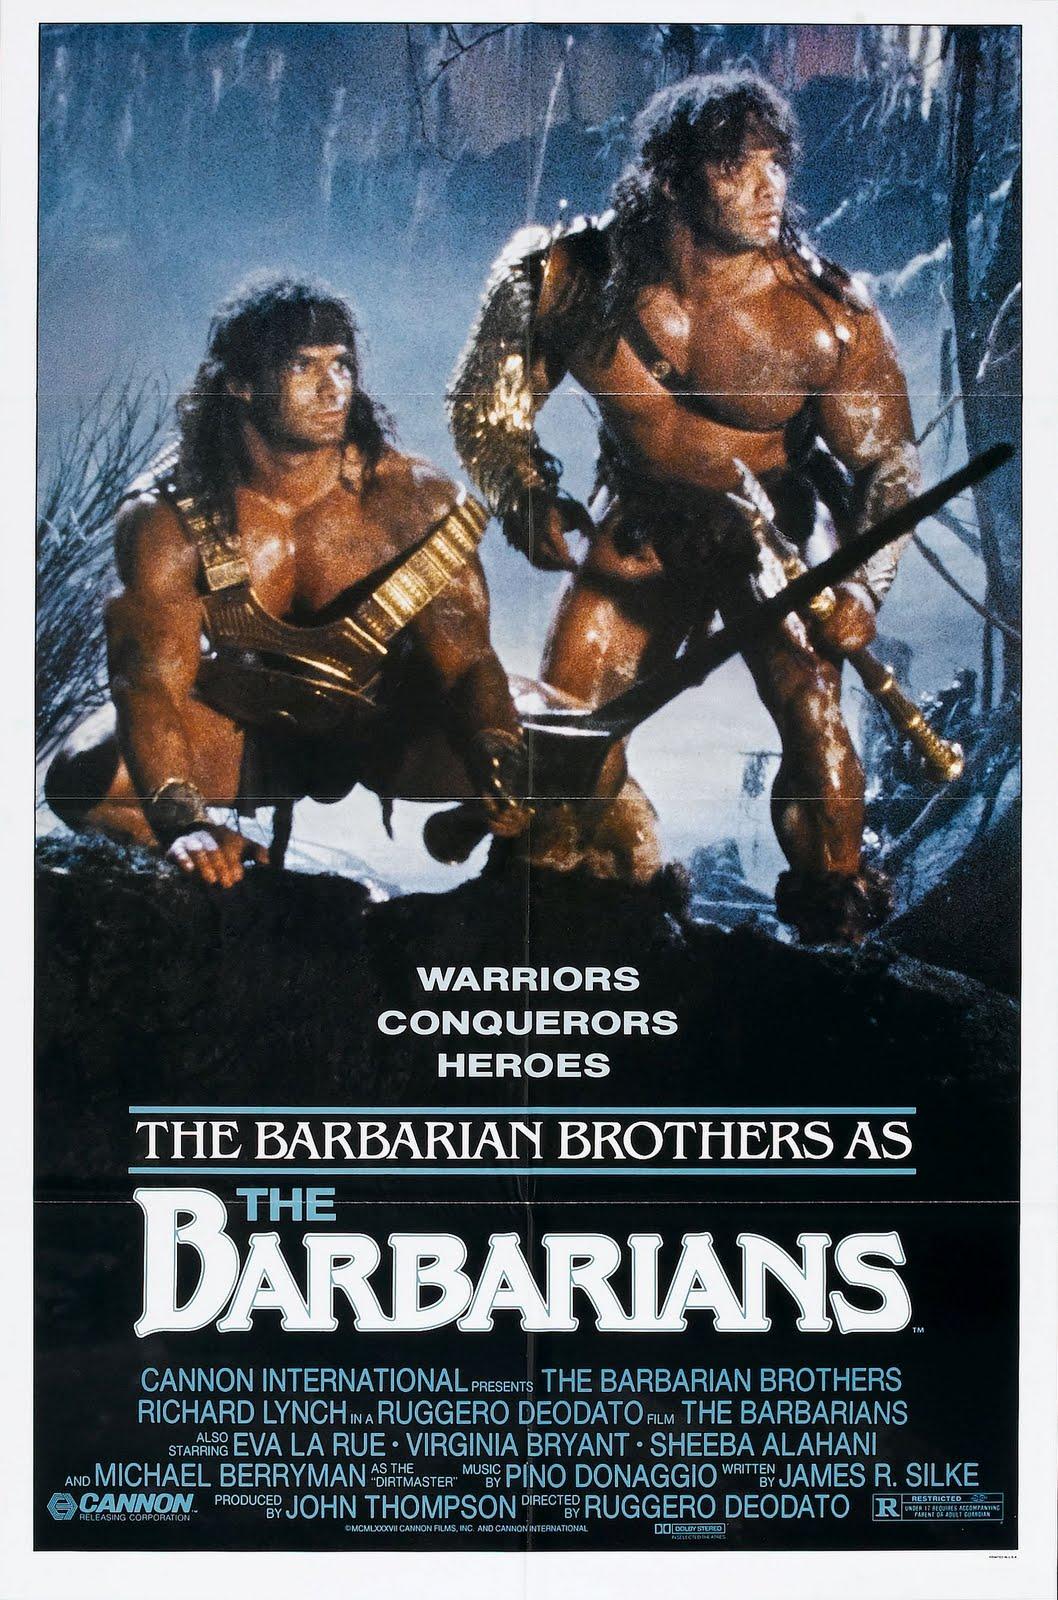 barbarians_poster_1987_01.jpg